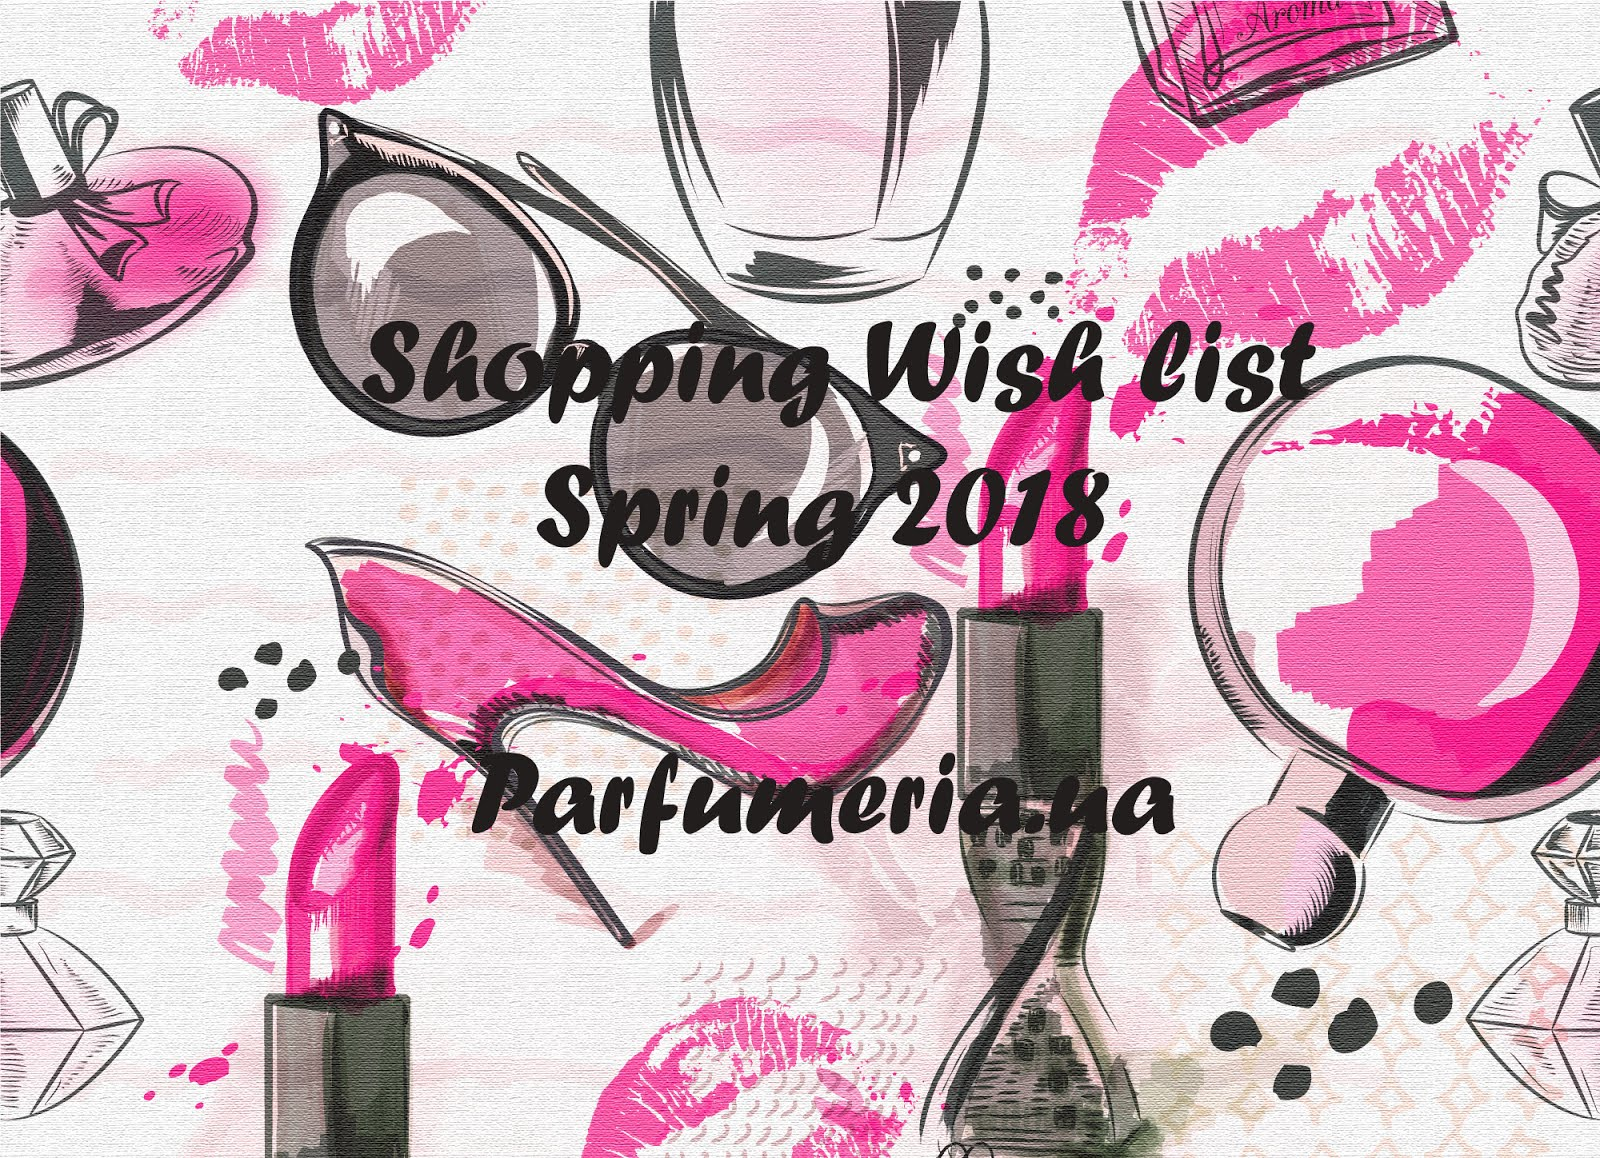 Shopping Wish list Spring 2018